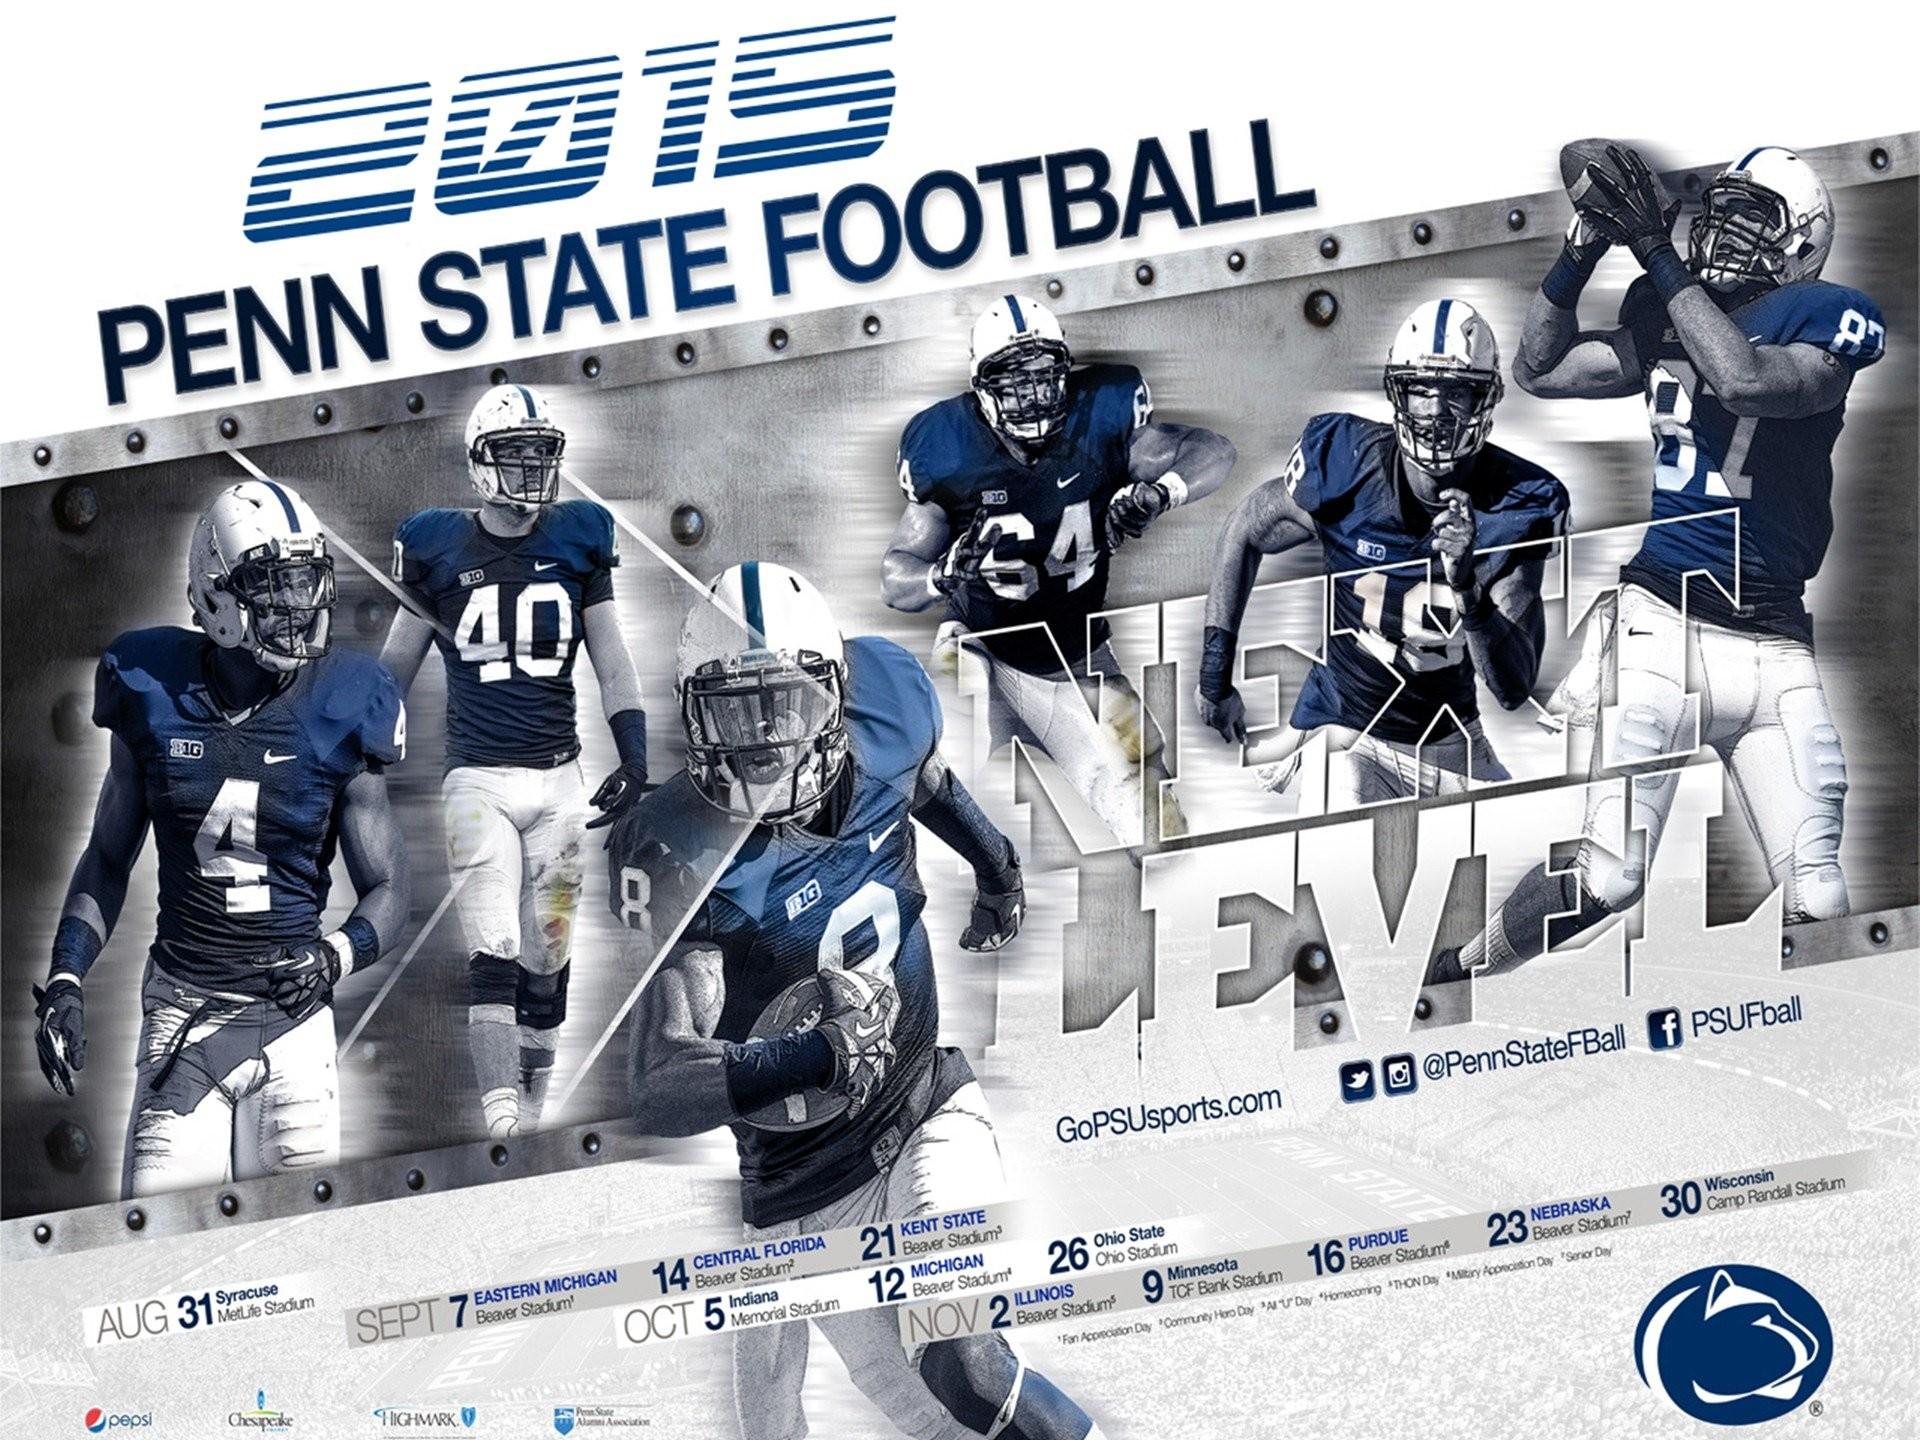 penn state football iphone wallpaper – photo #4